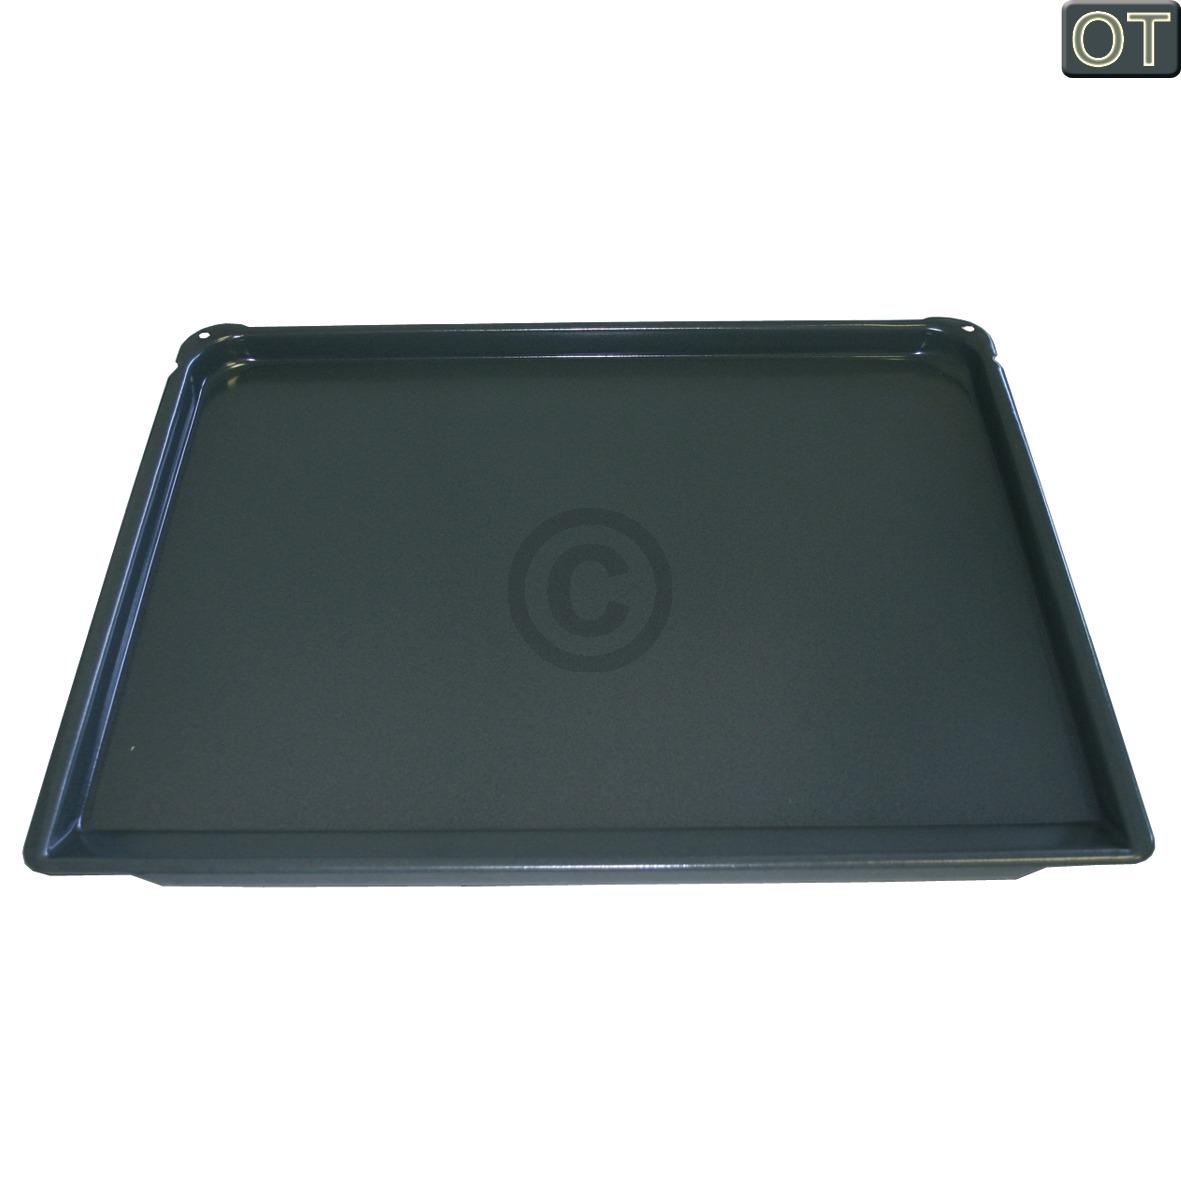 Backblech Neff 00434038 456x370x23mm emailliert für Backofen